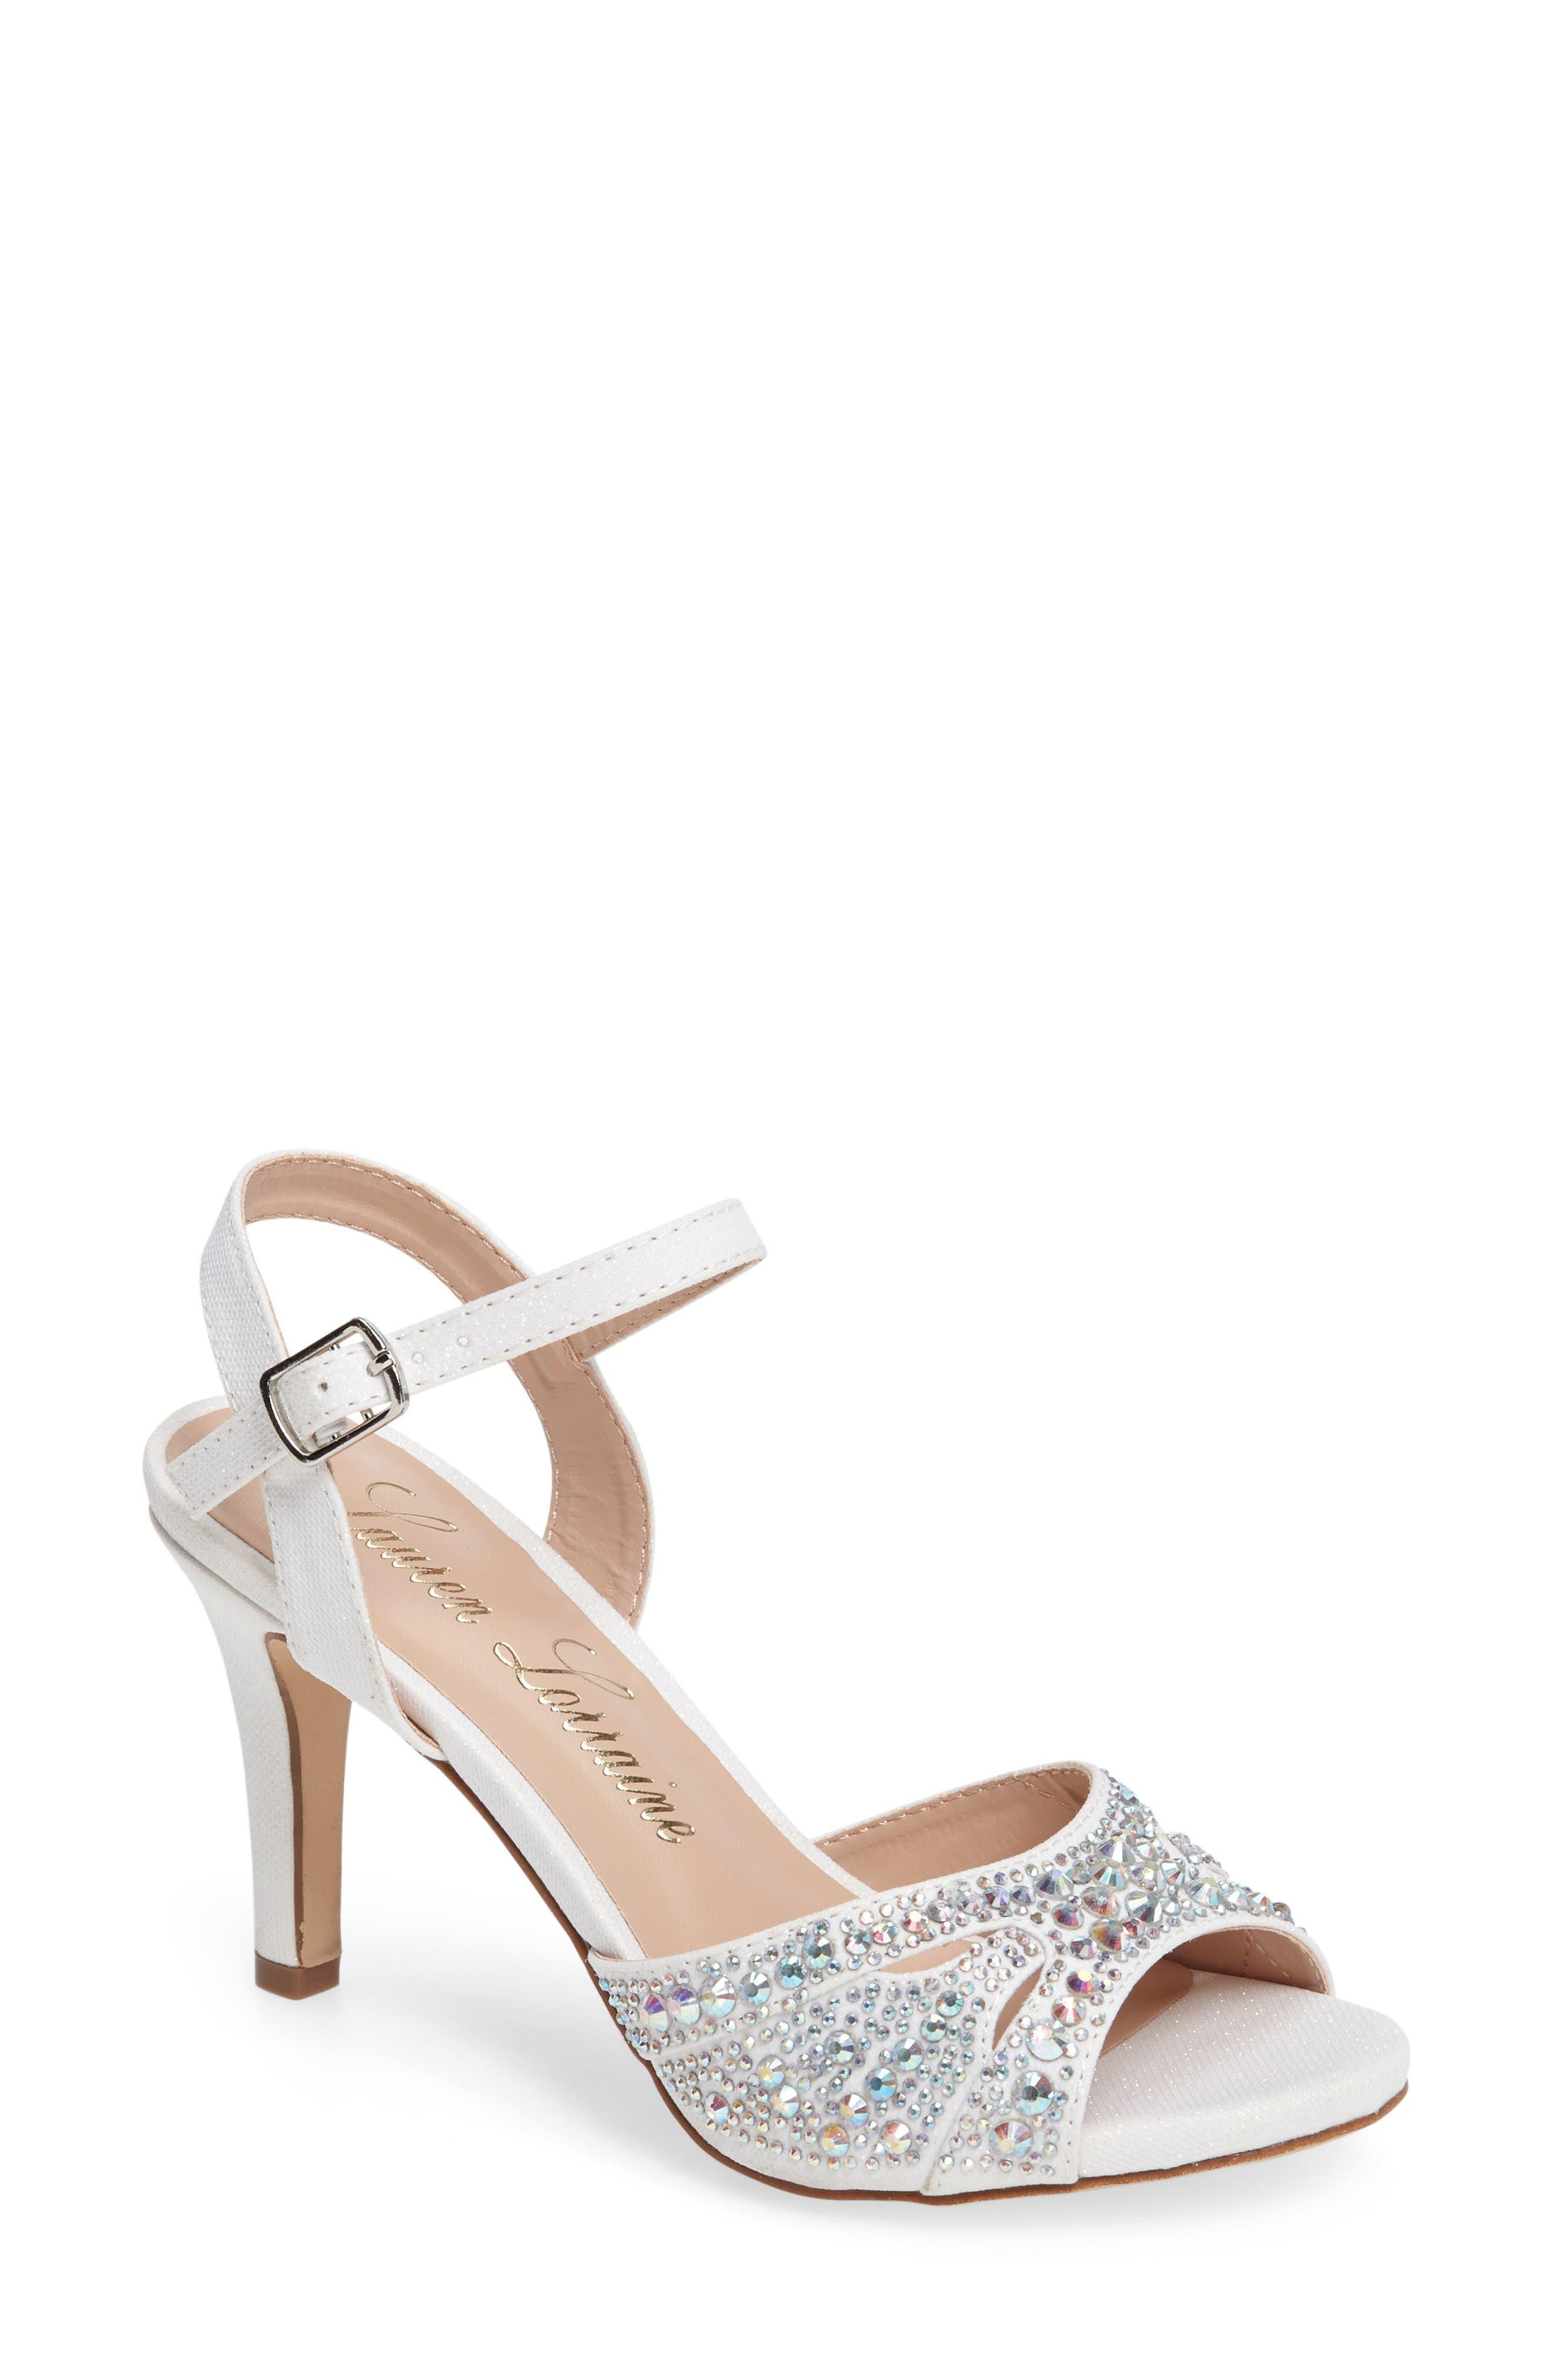 Florence Crystal Embellished Sandal,                             Main thumbnail 1, color,                             White